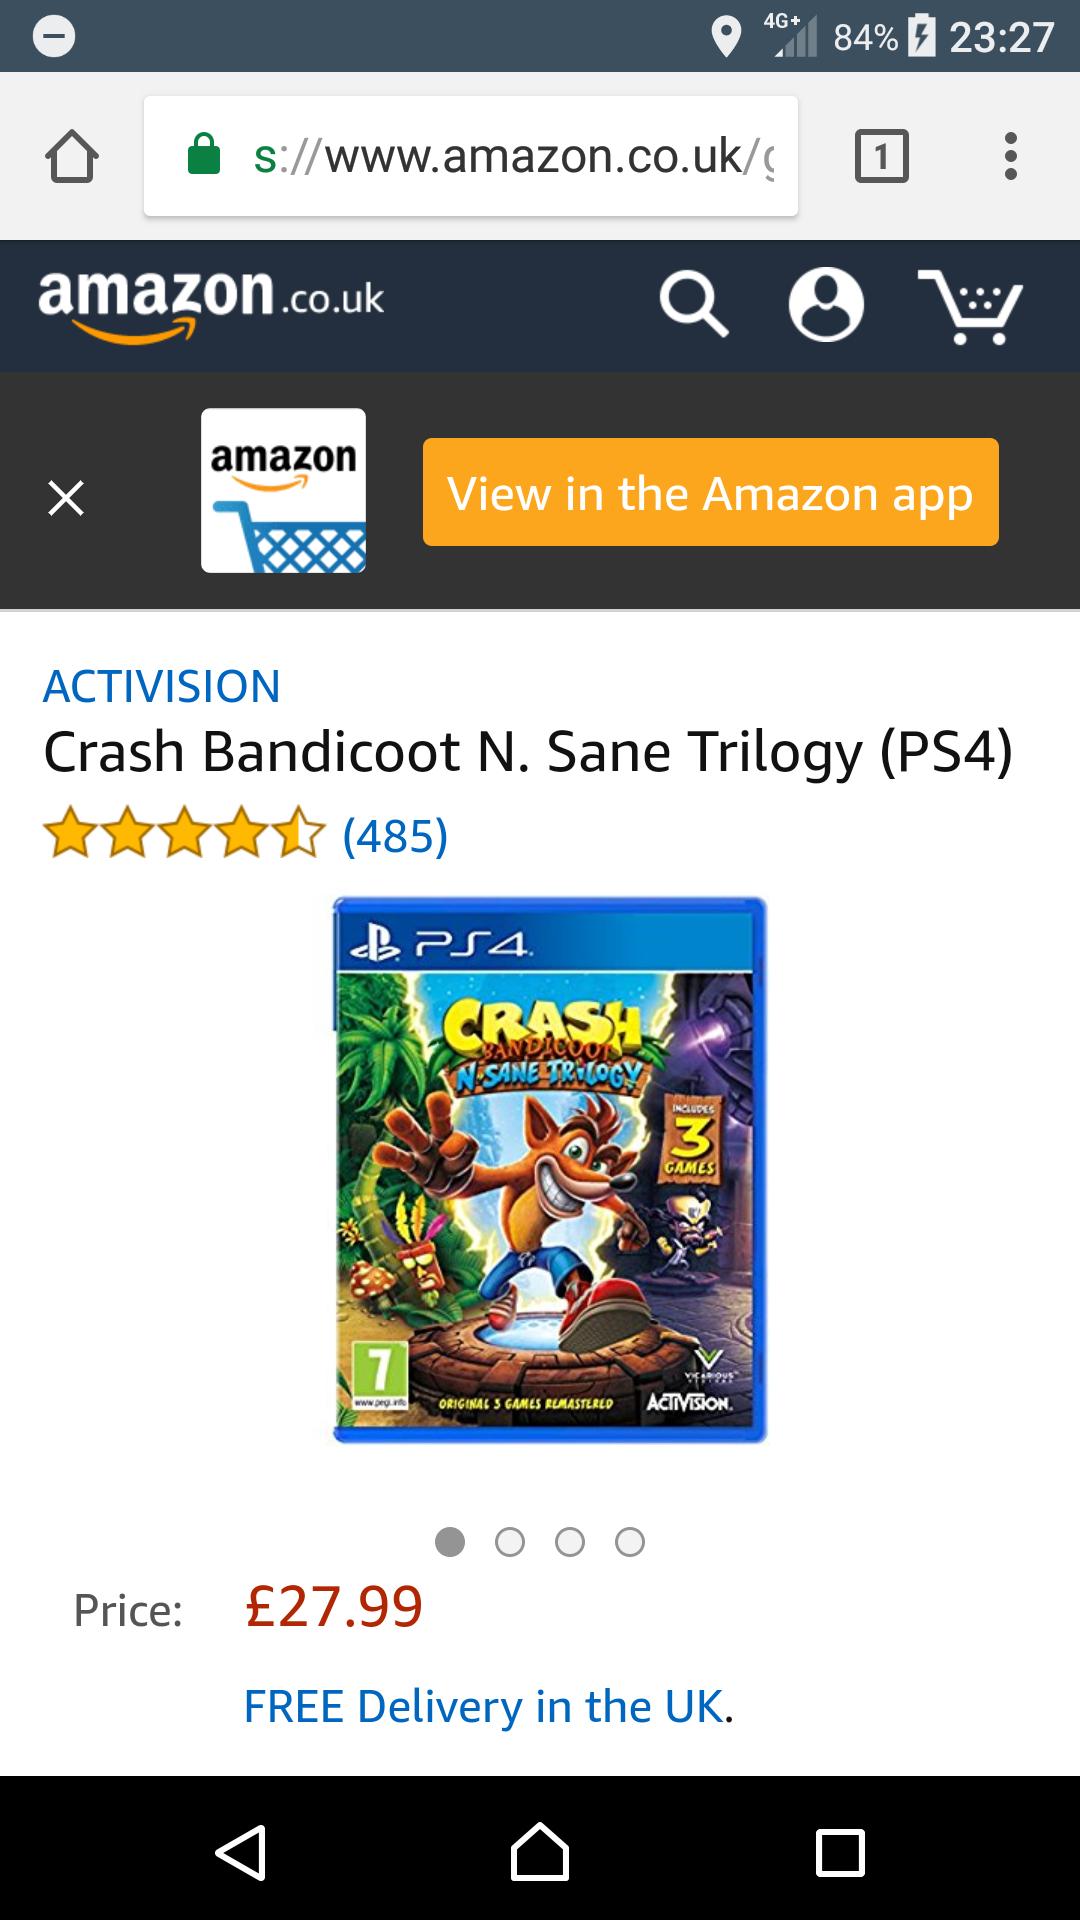 *READ DESCRIPTION FULLY* Crash bandicoot n sane trilogy ps4 £27.99 POSSIBLY £11.99 AFTER vouchers @ Amazon